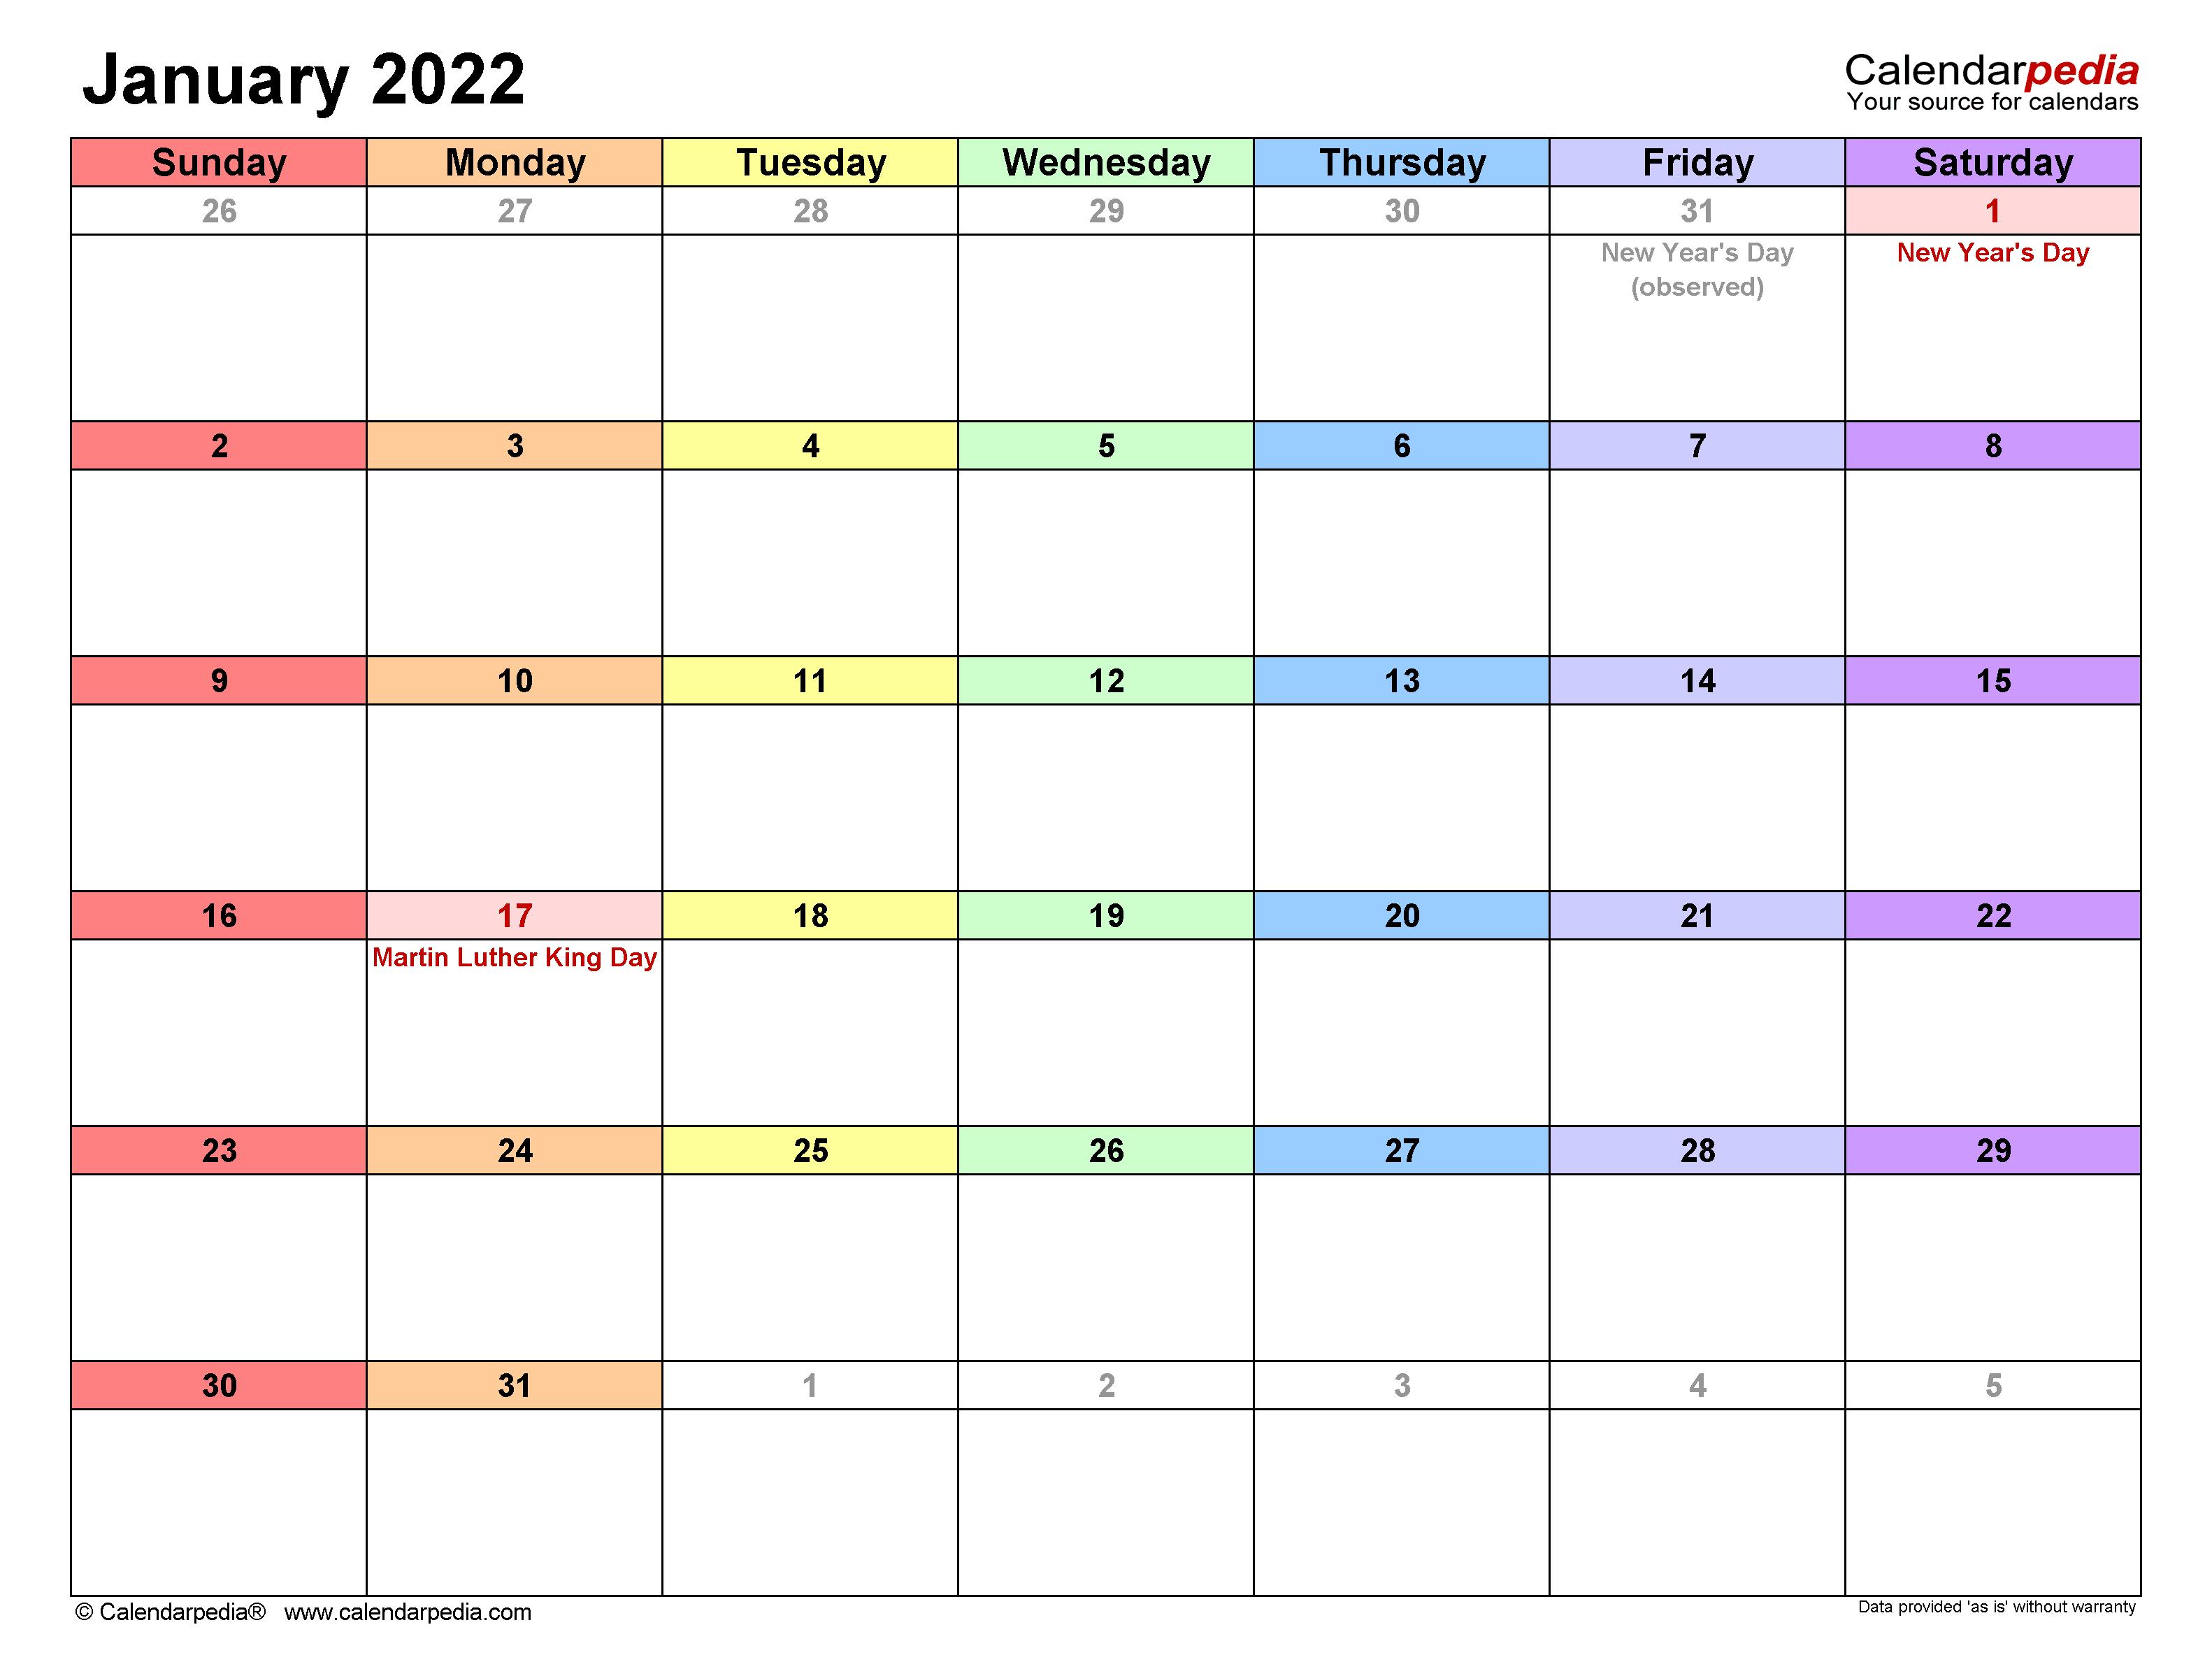 2022 January Calendar Printable.January 2022 Calendar Templates For Word Excel And Pdf